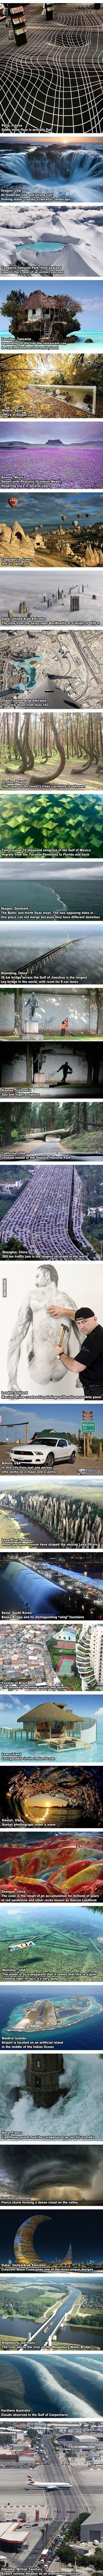 Awesomeness around the world